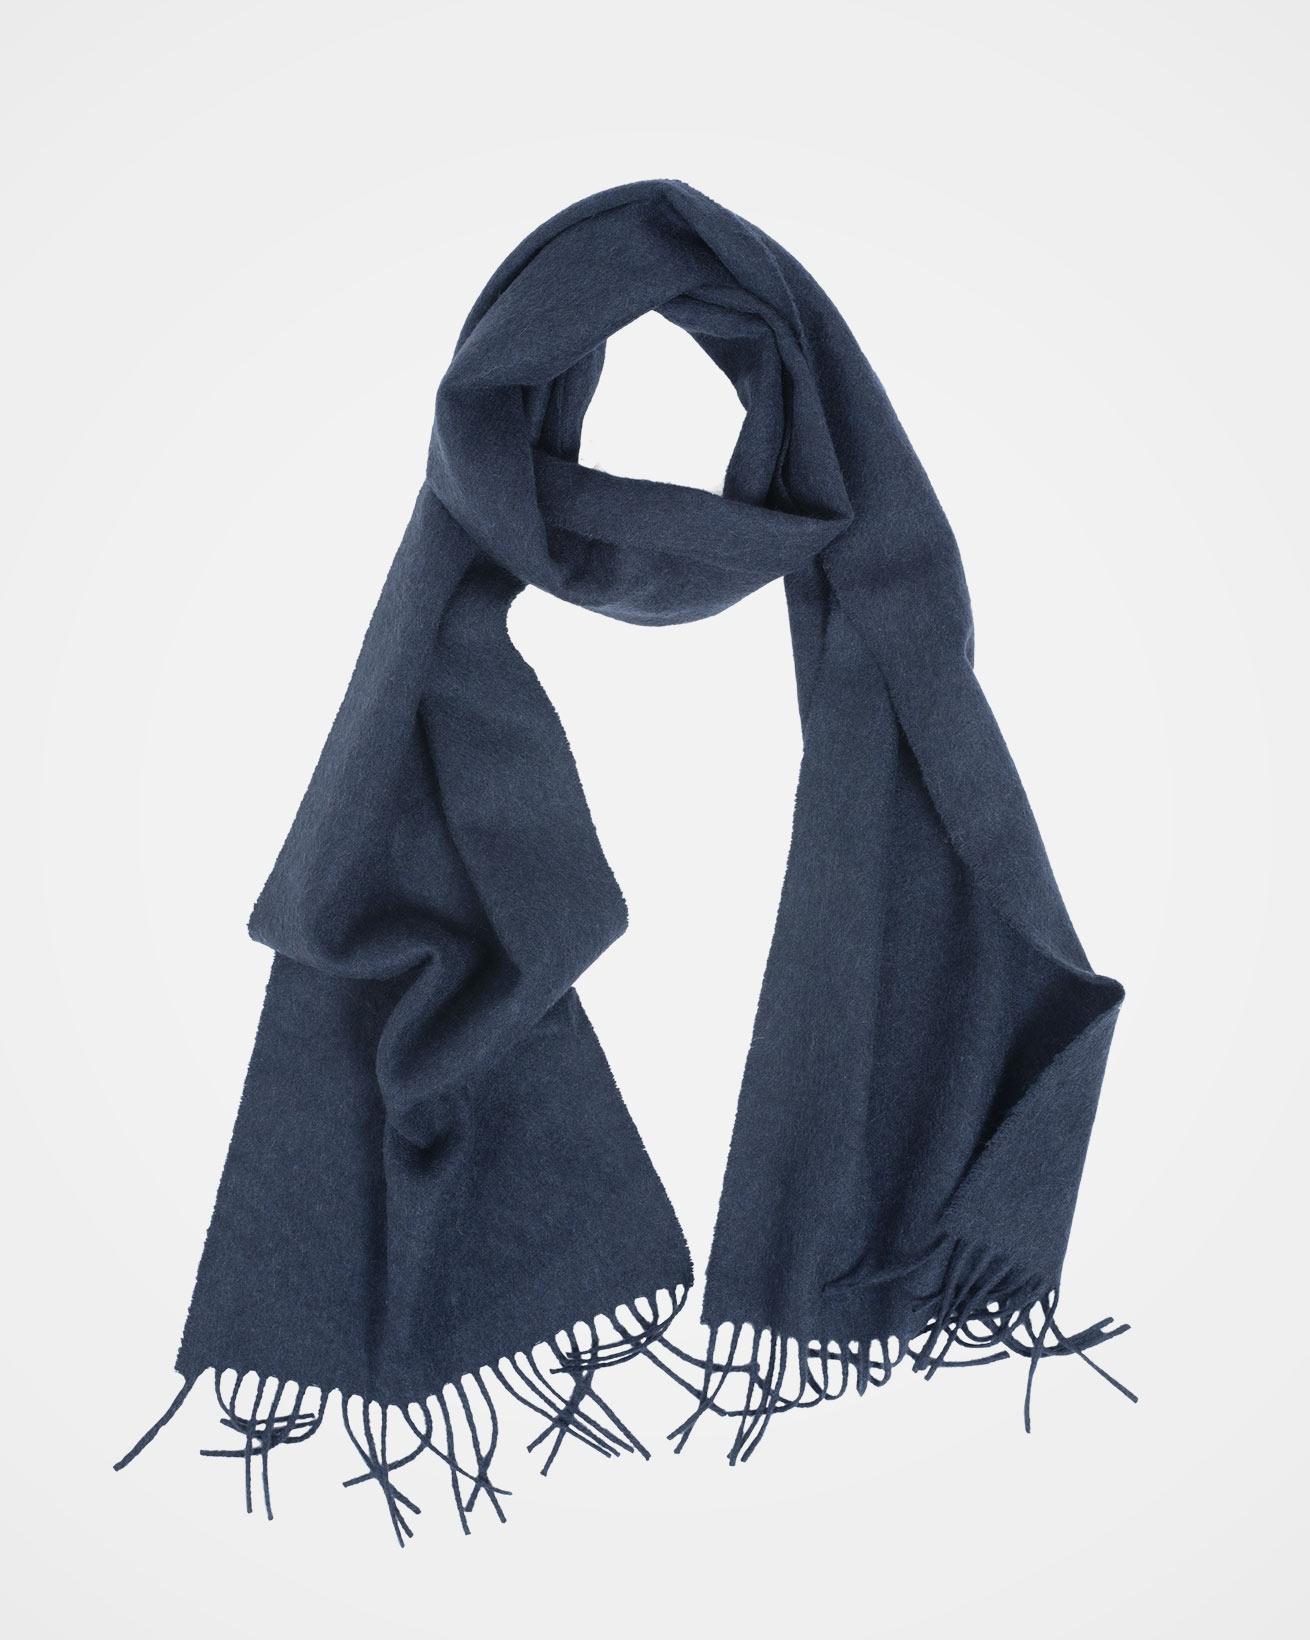 7643_classic-cashmere-scarf_navy_swirl.jpg